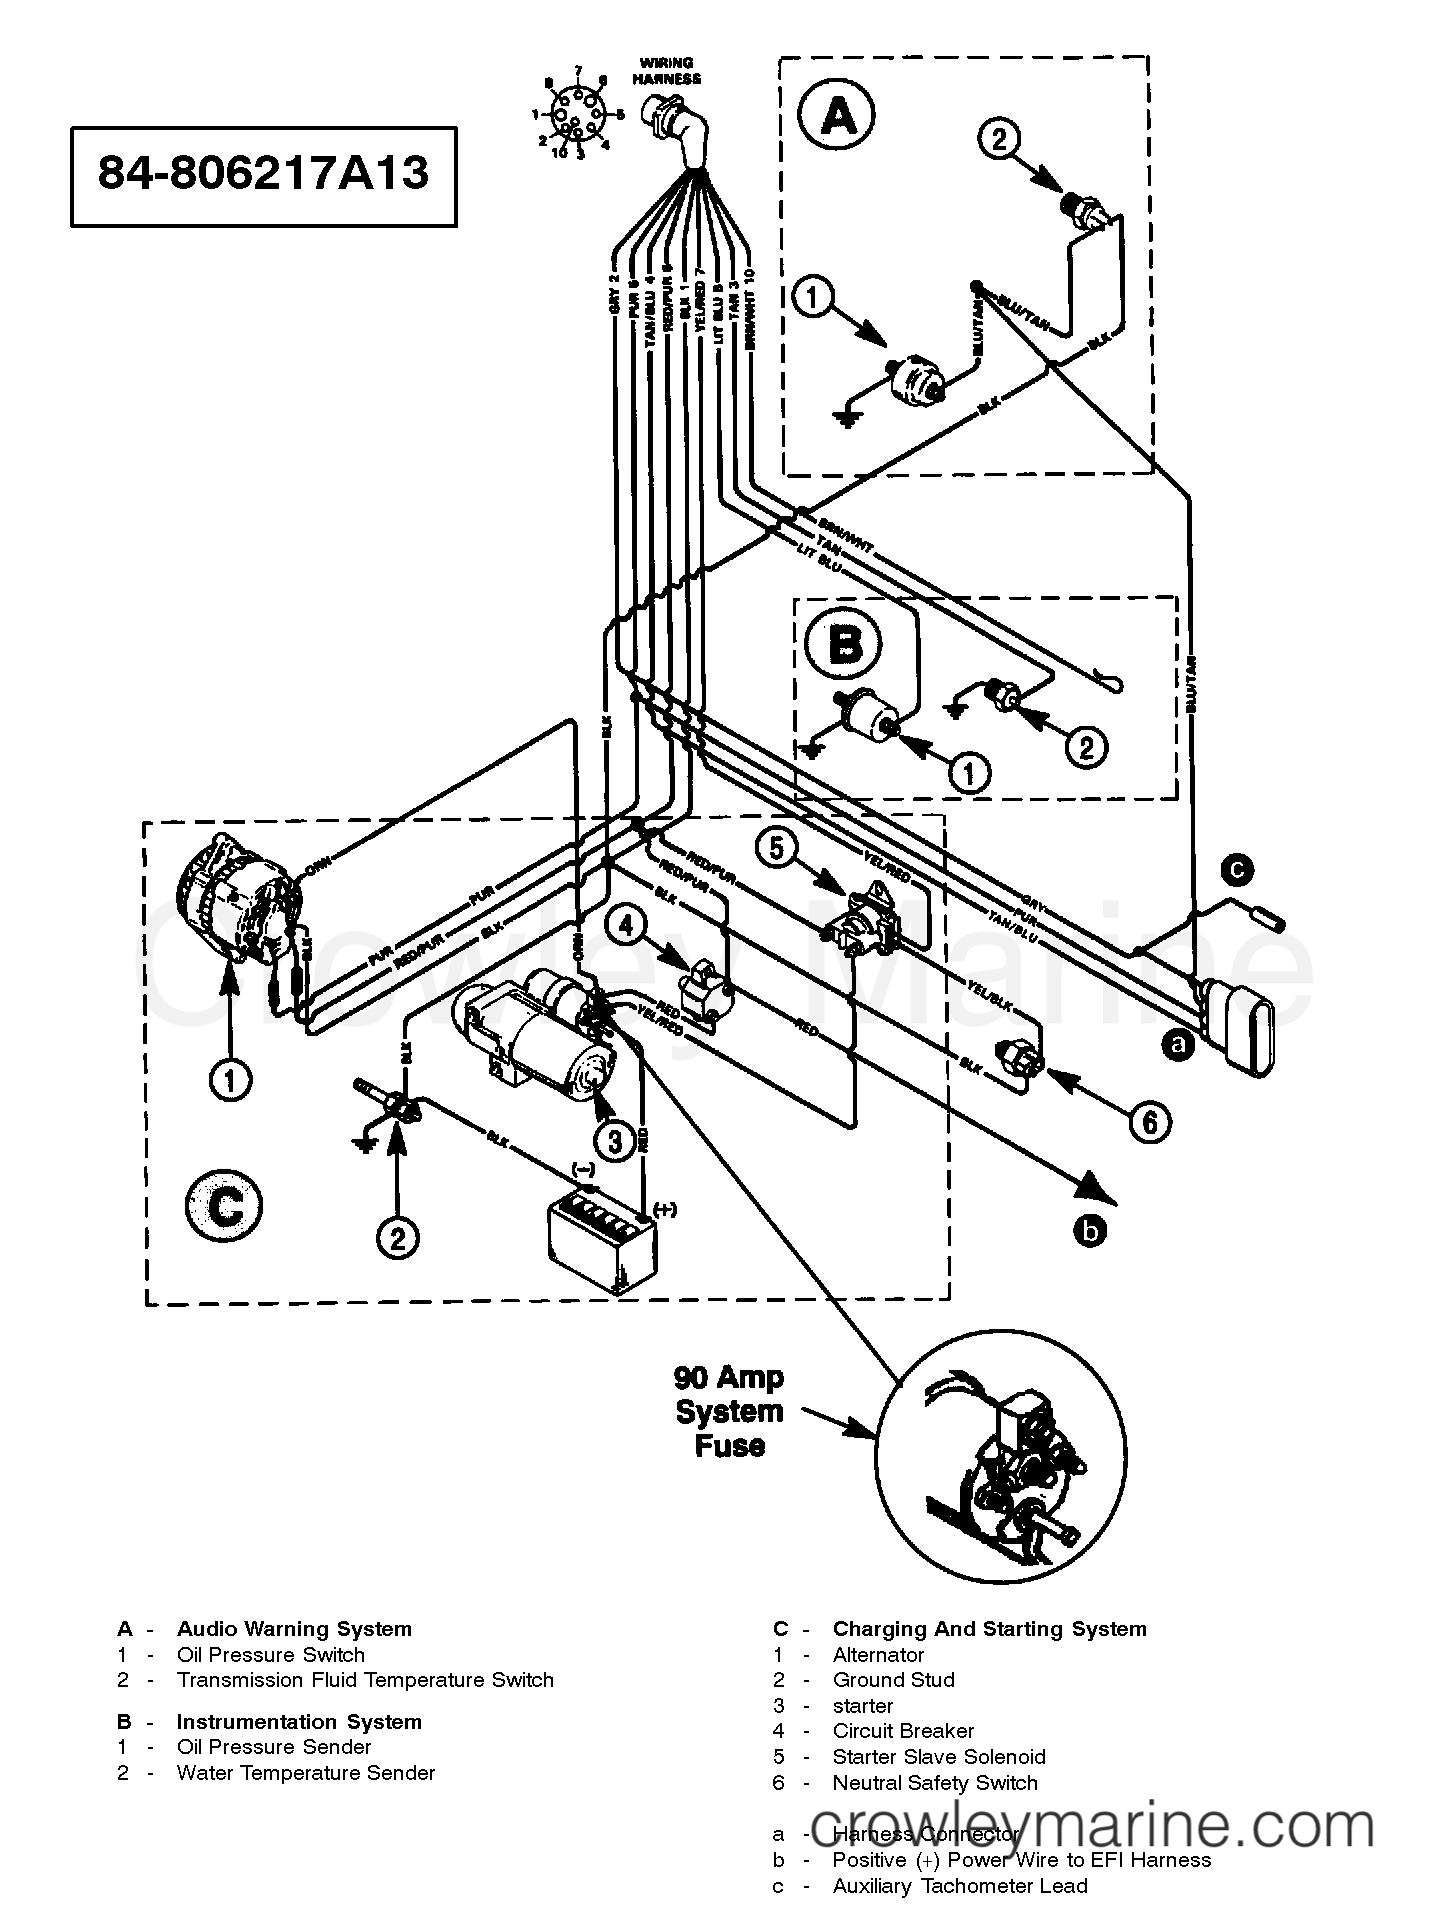 Wiring Harness Engine 1995 Mercury Inboard 350 Mag Efi Oil Pressure Sender Diagram Mp 357j111hs